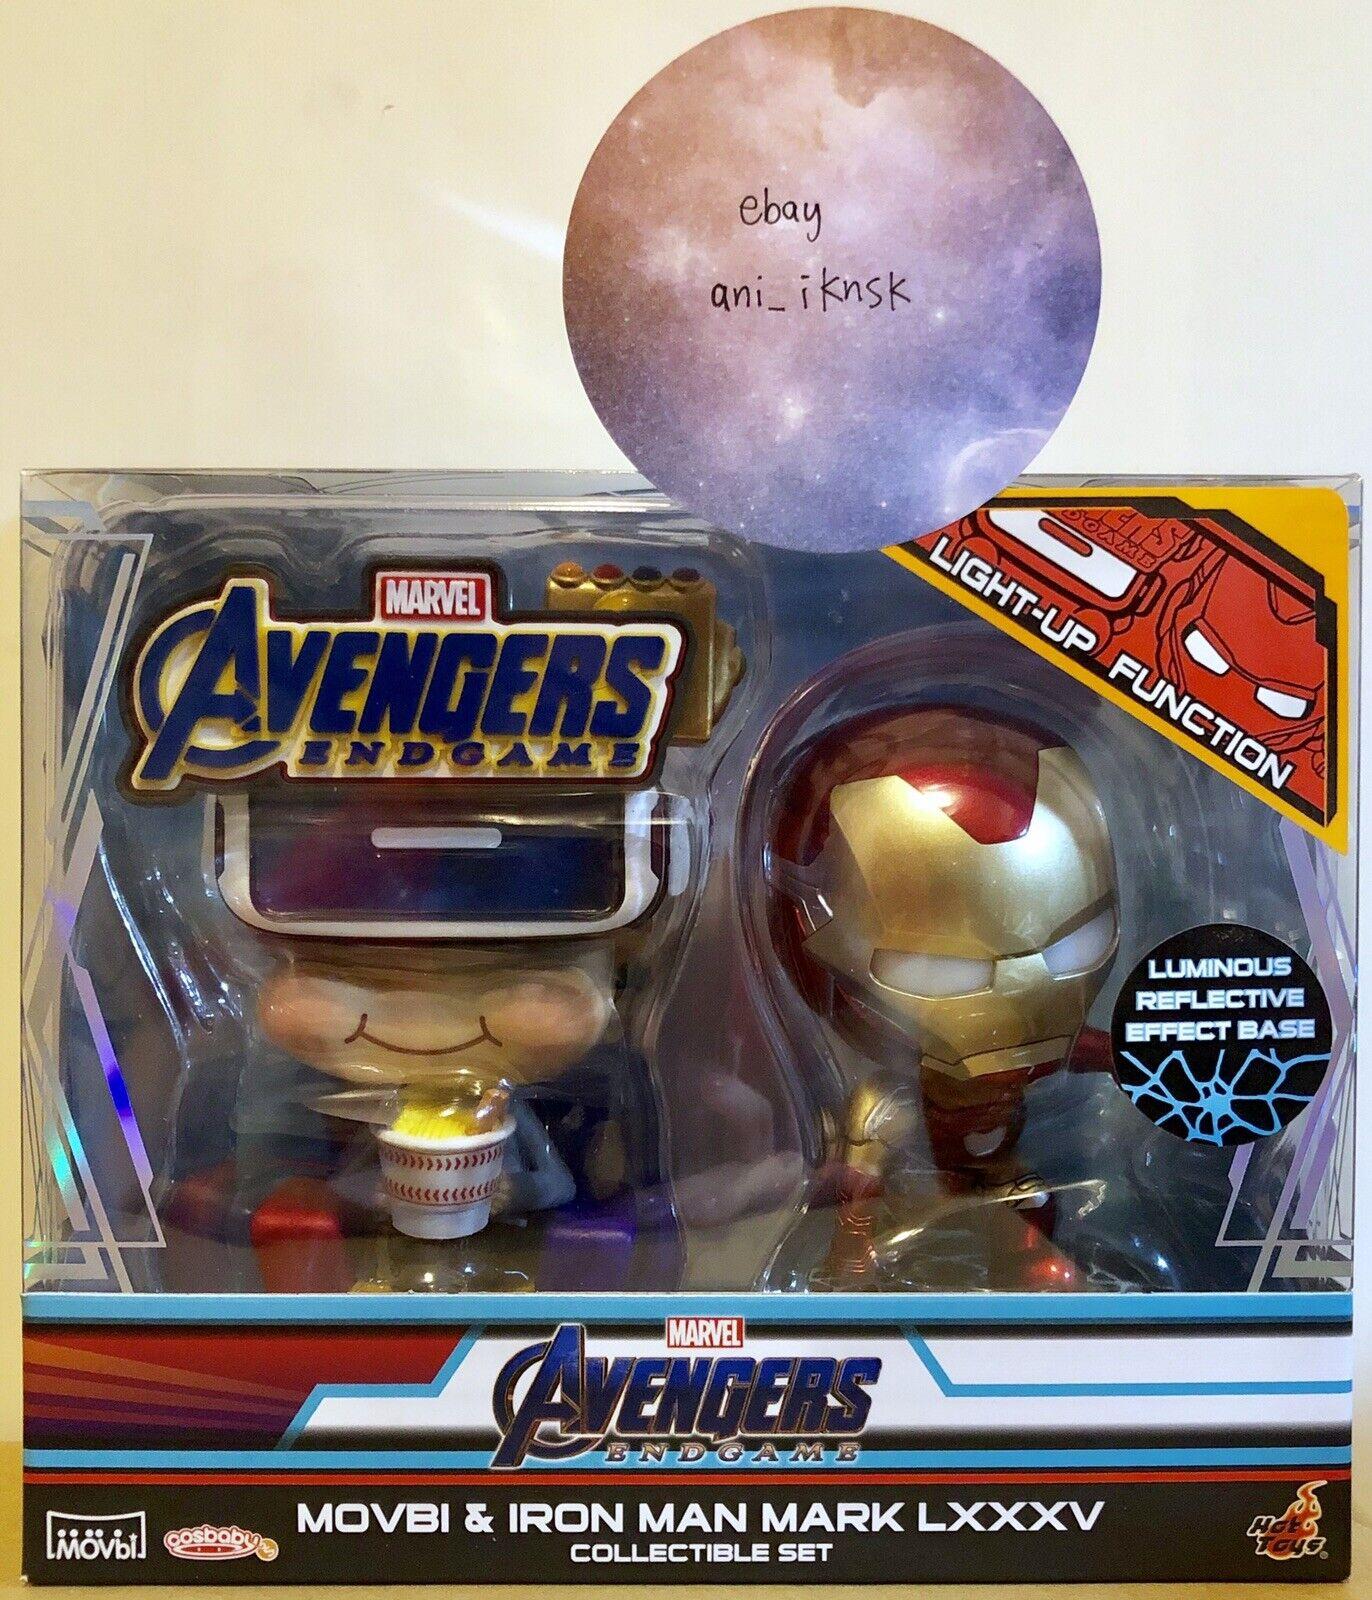 Hot Toys Cosbaby Marvel Avengers Endgame Movbi&Iron Man Mark LXXXV Set BRAND NEW